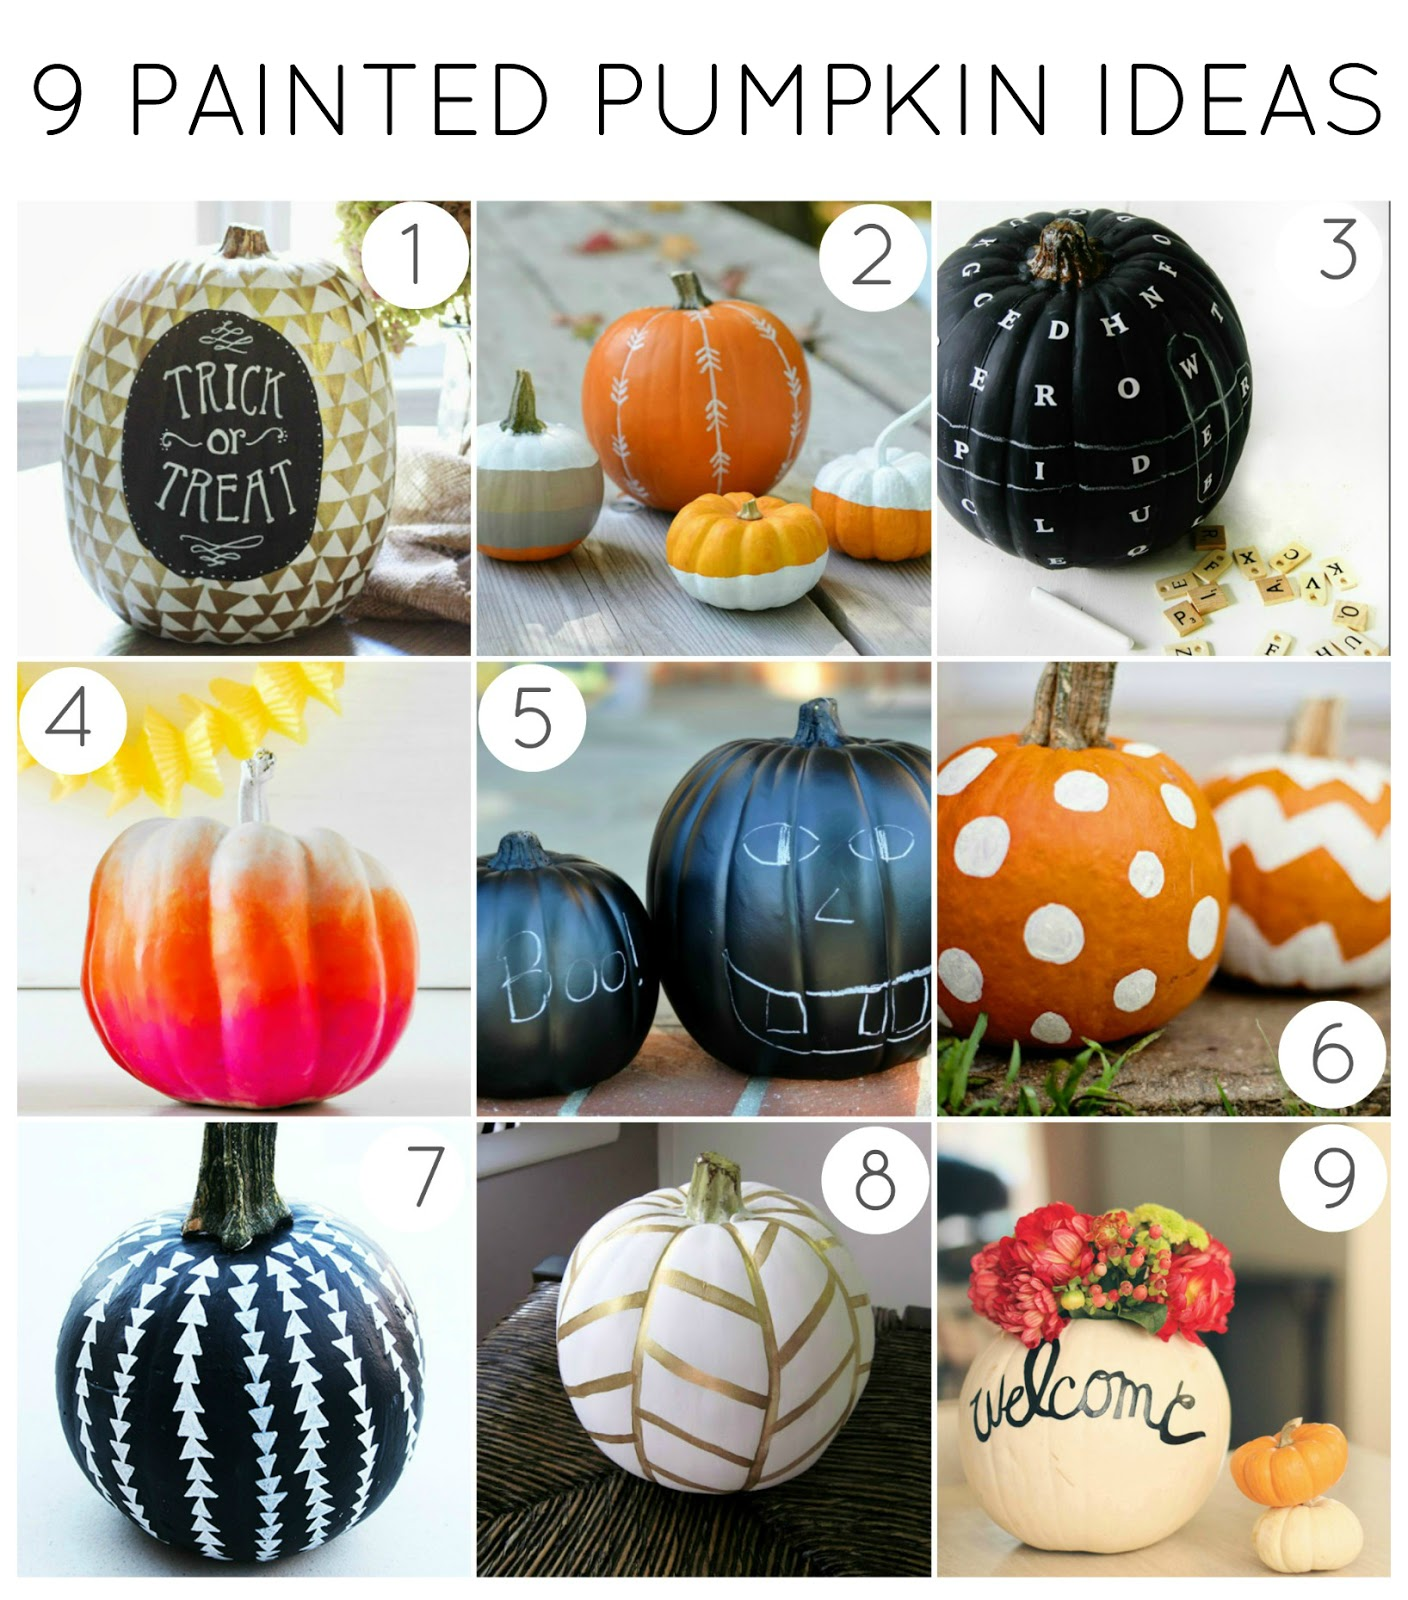 My 9 Favorite Painted Pumpkin Ideas